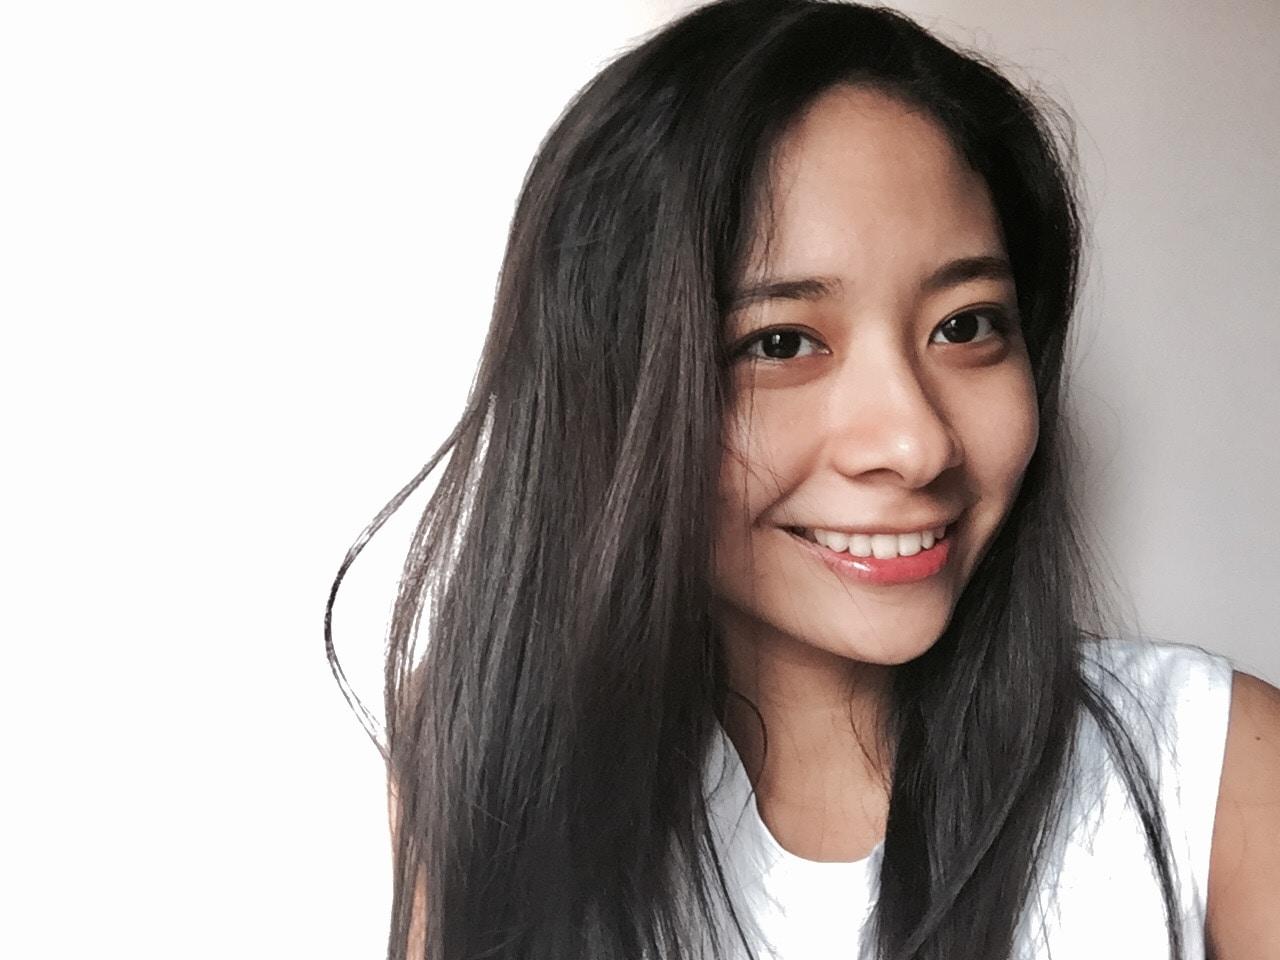 Go to Merita Bin's profile